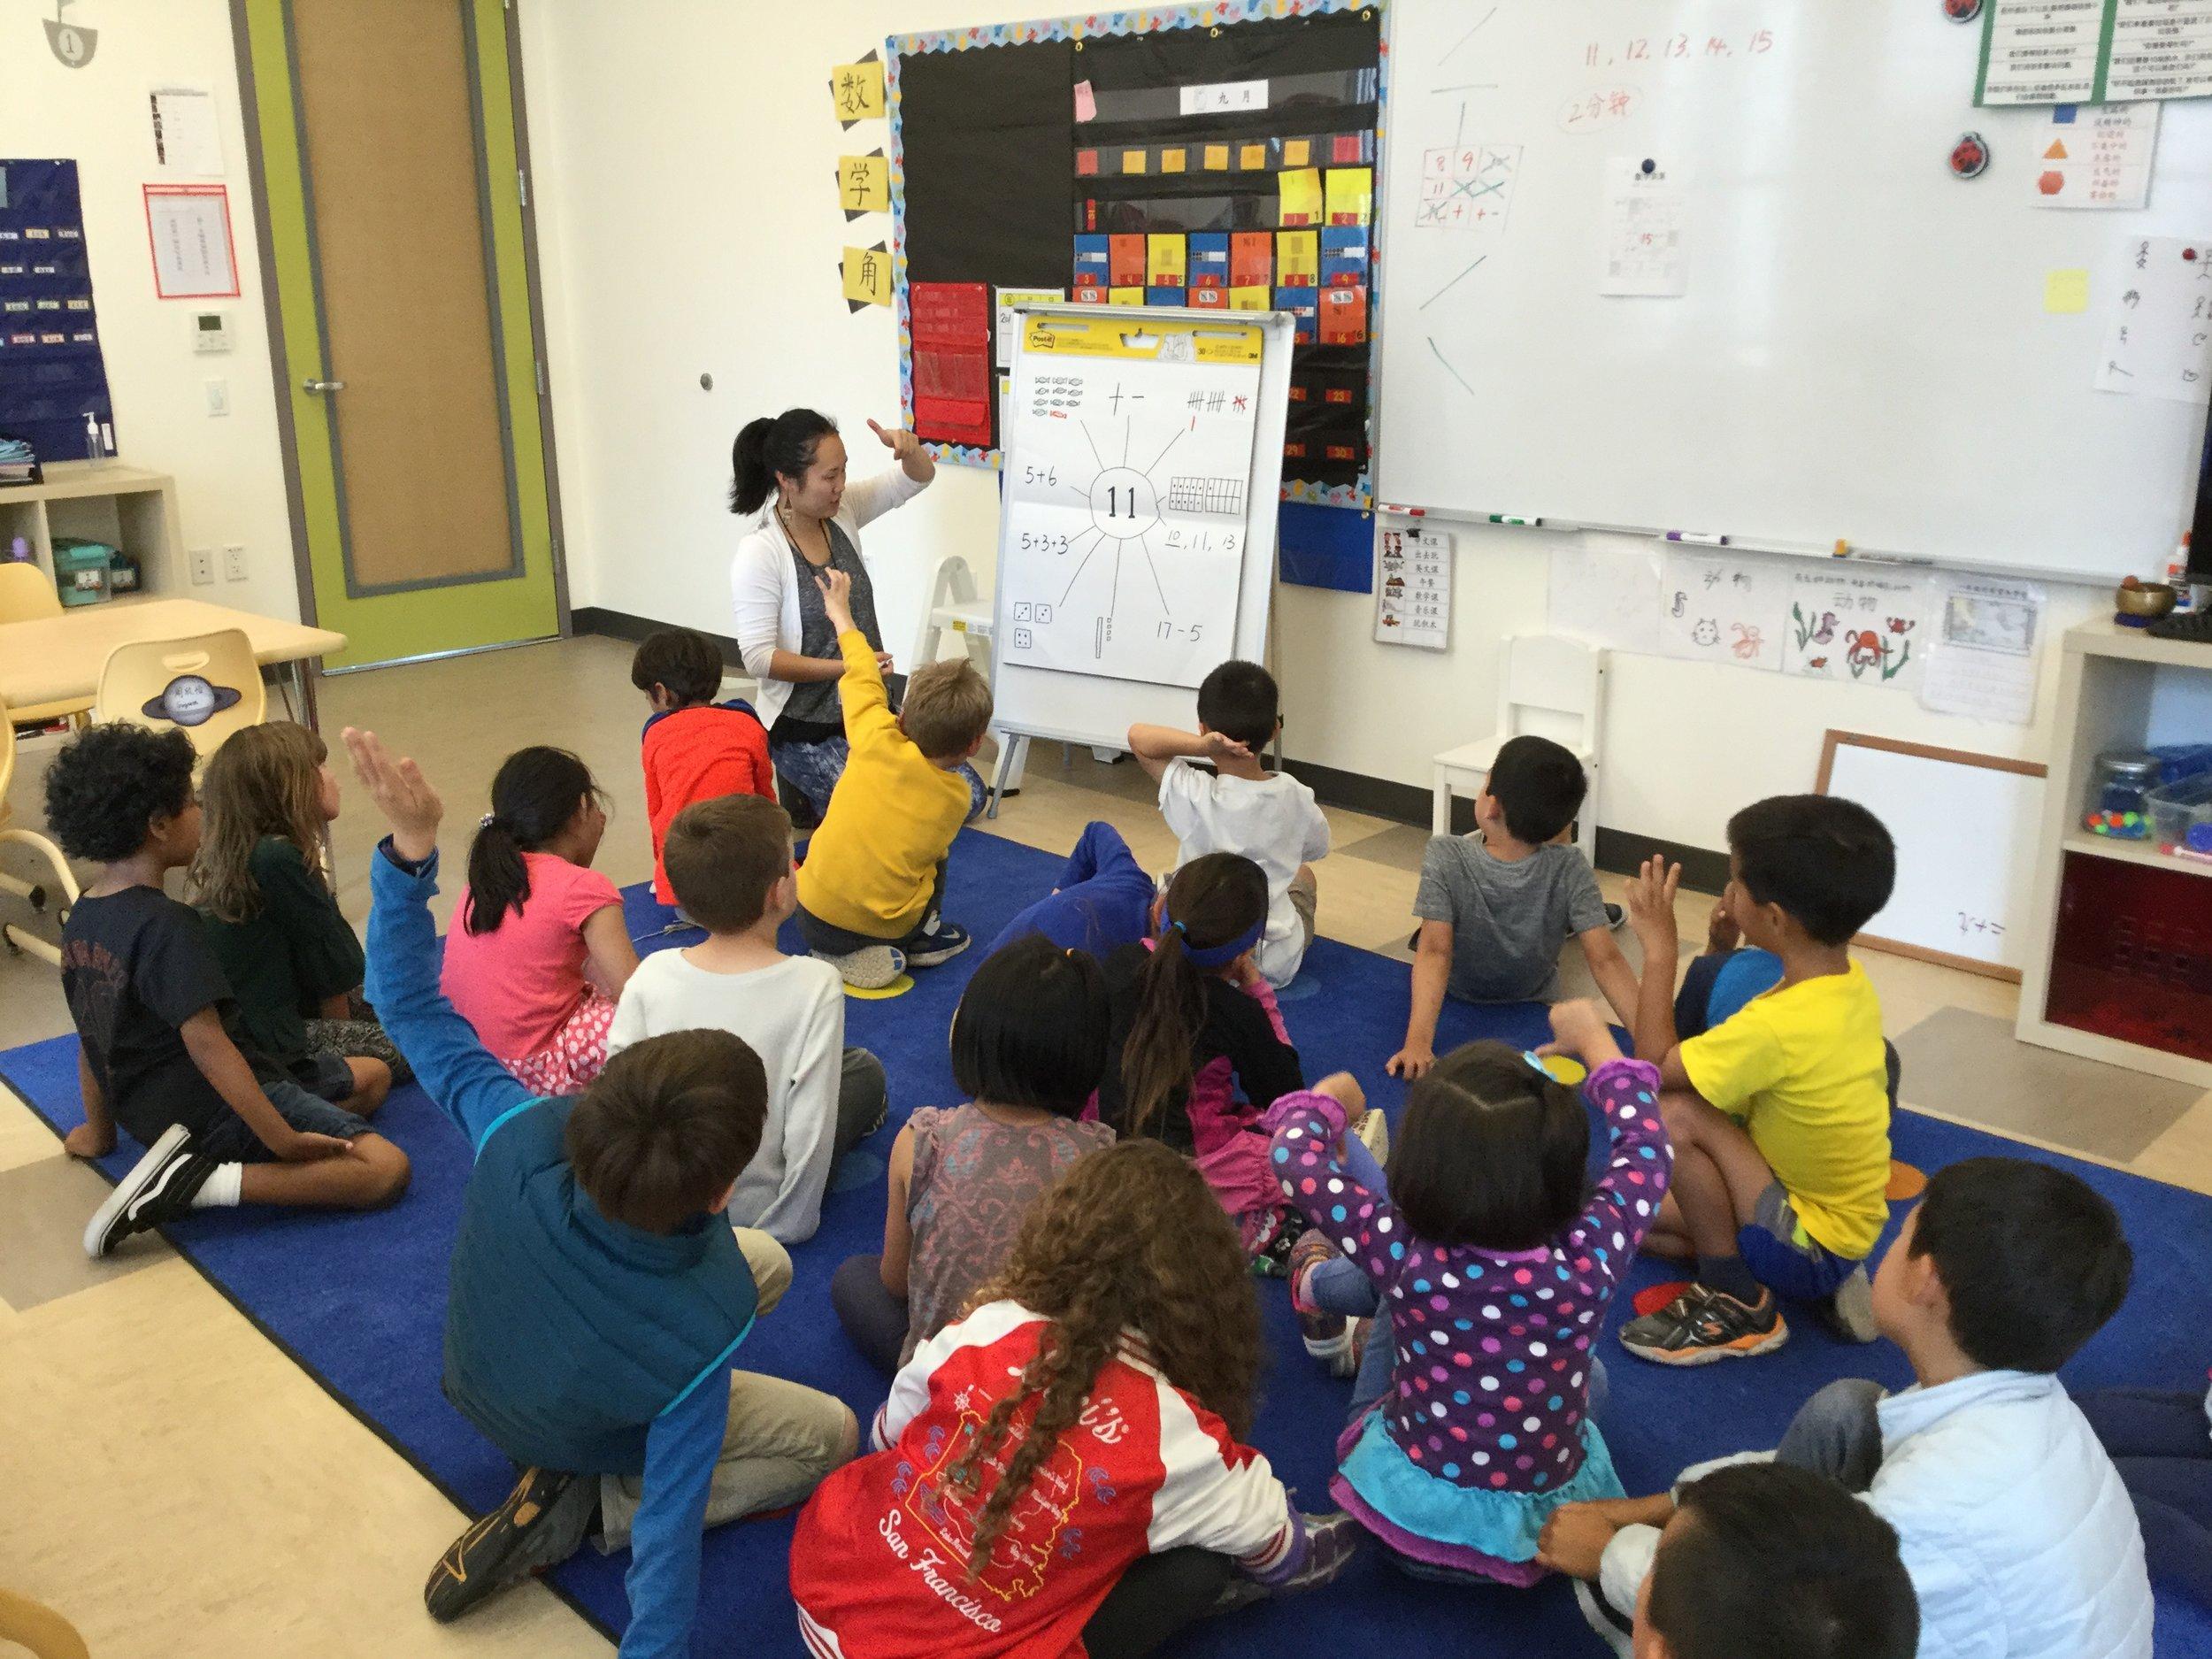 Busy first graders enjoying class activity .